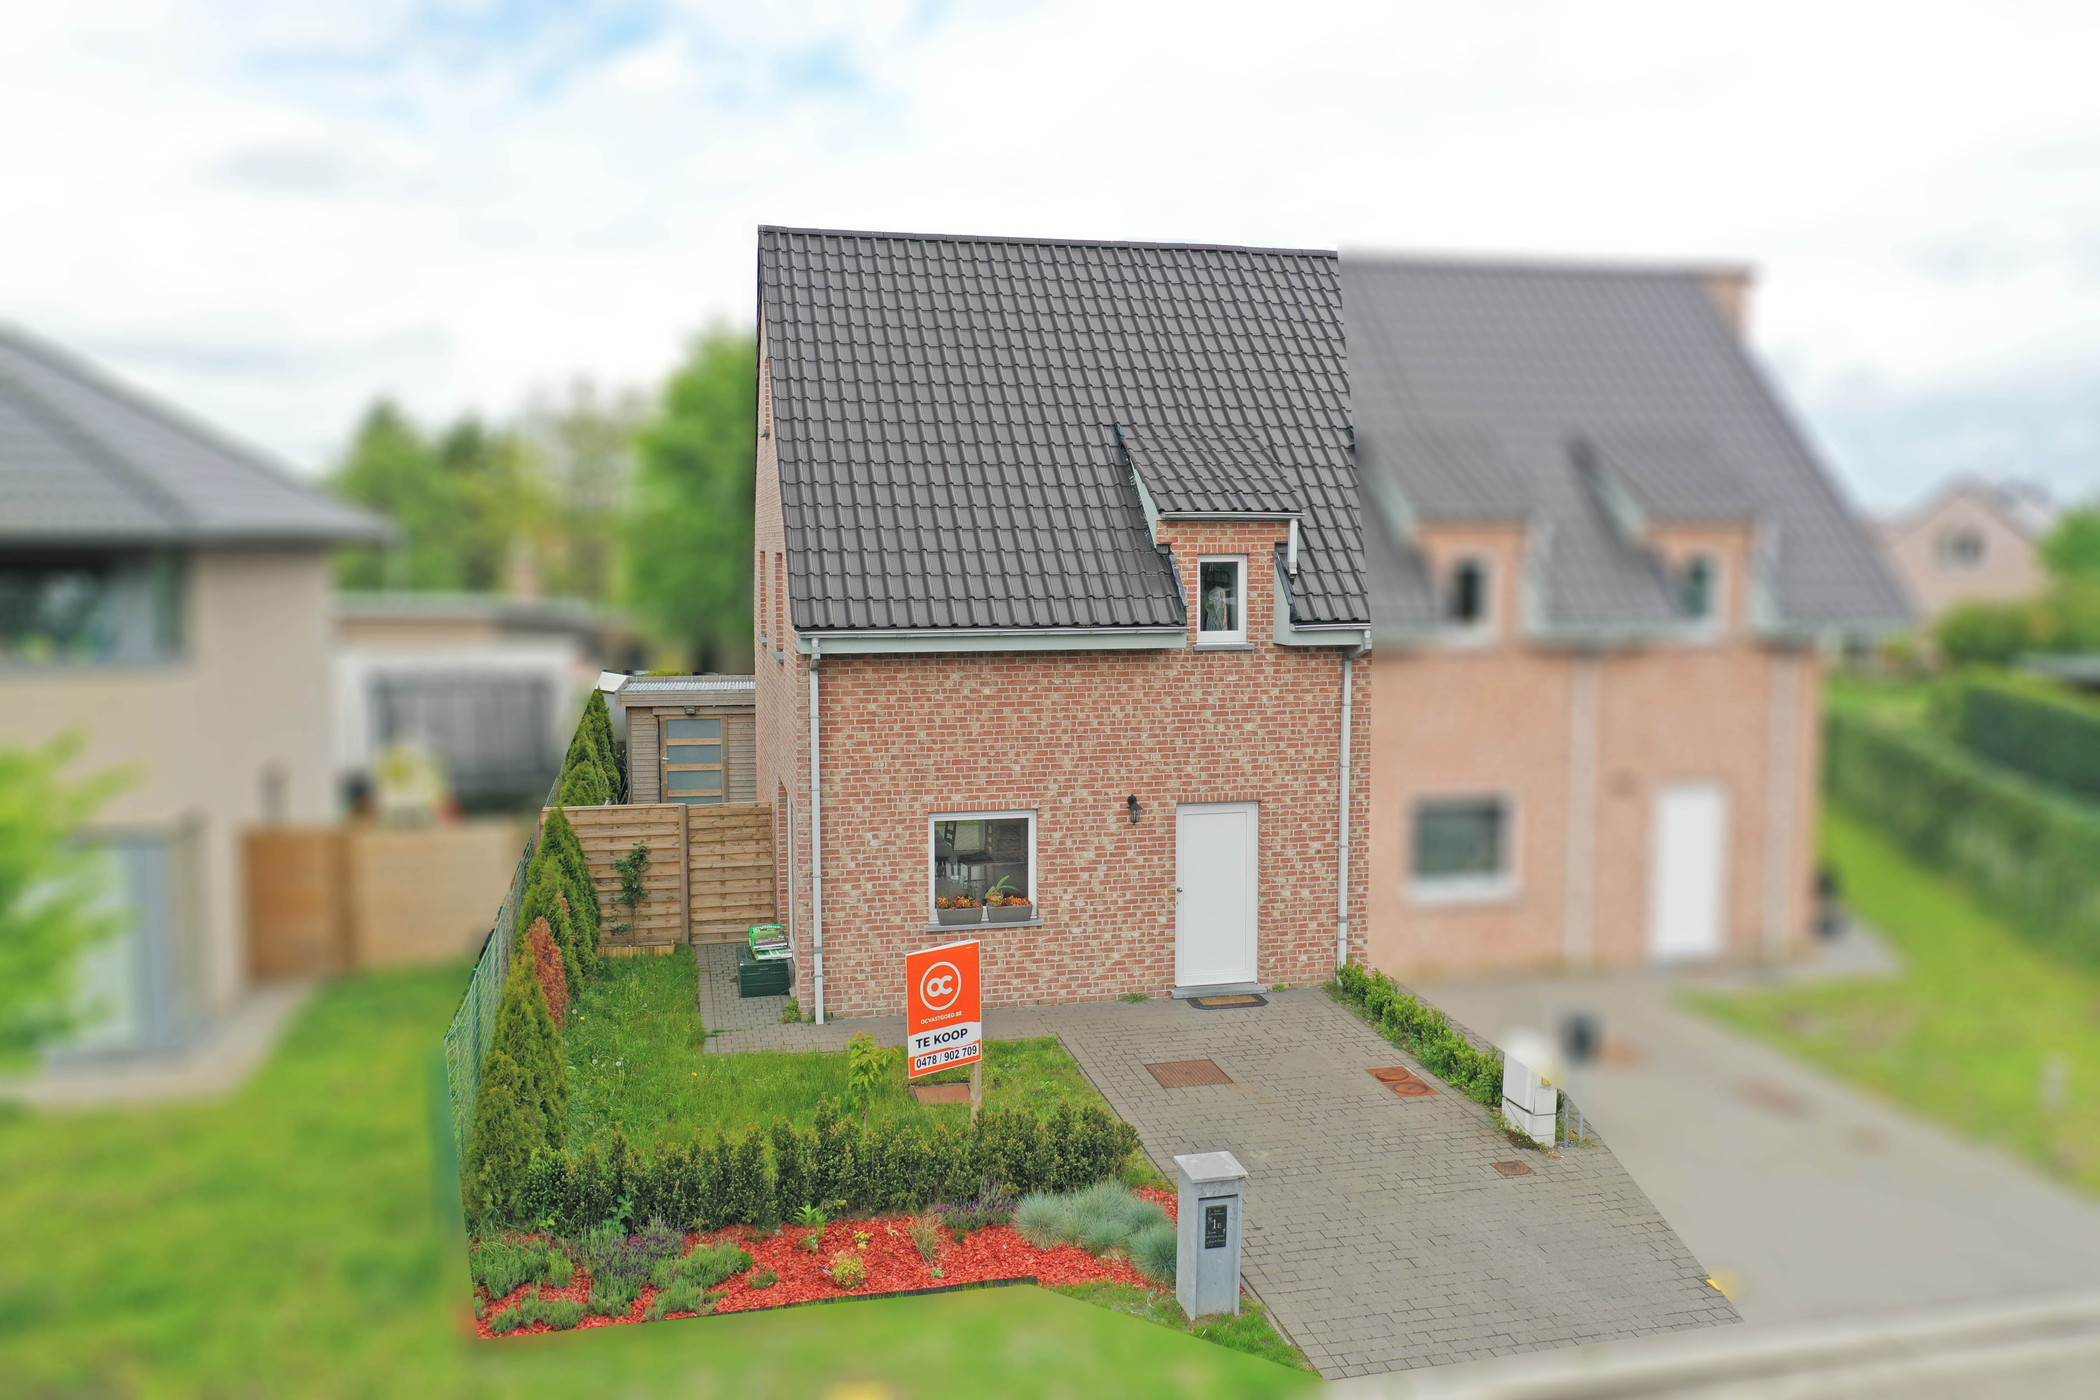 Nieuwbouwwoning met 3 slaapkamers in rustige woonwijk te Evergem te koop.